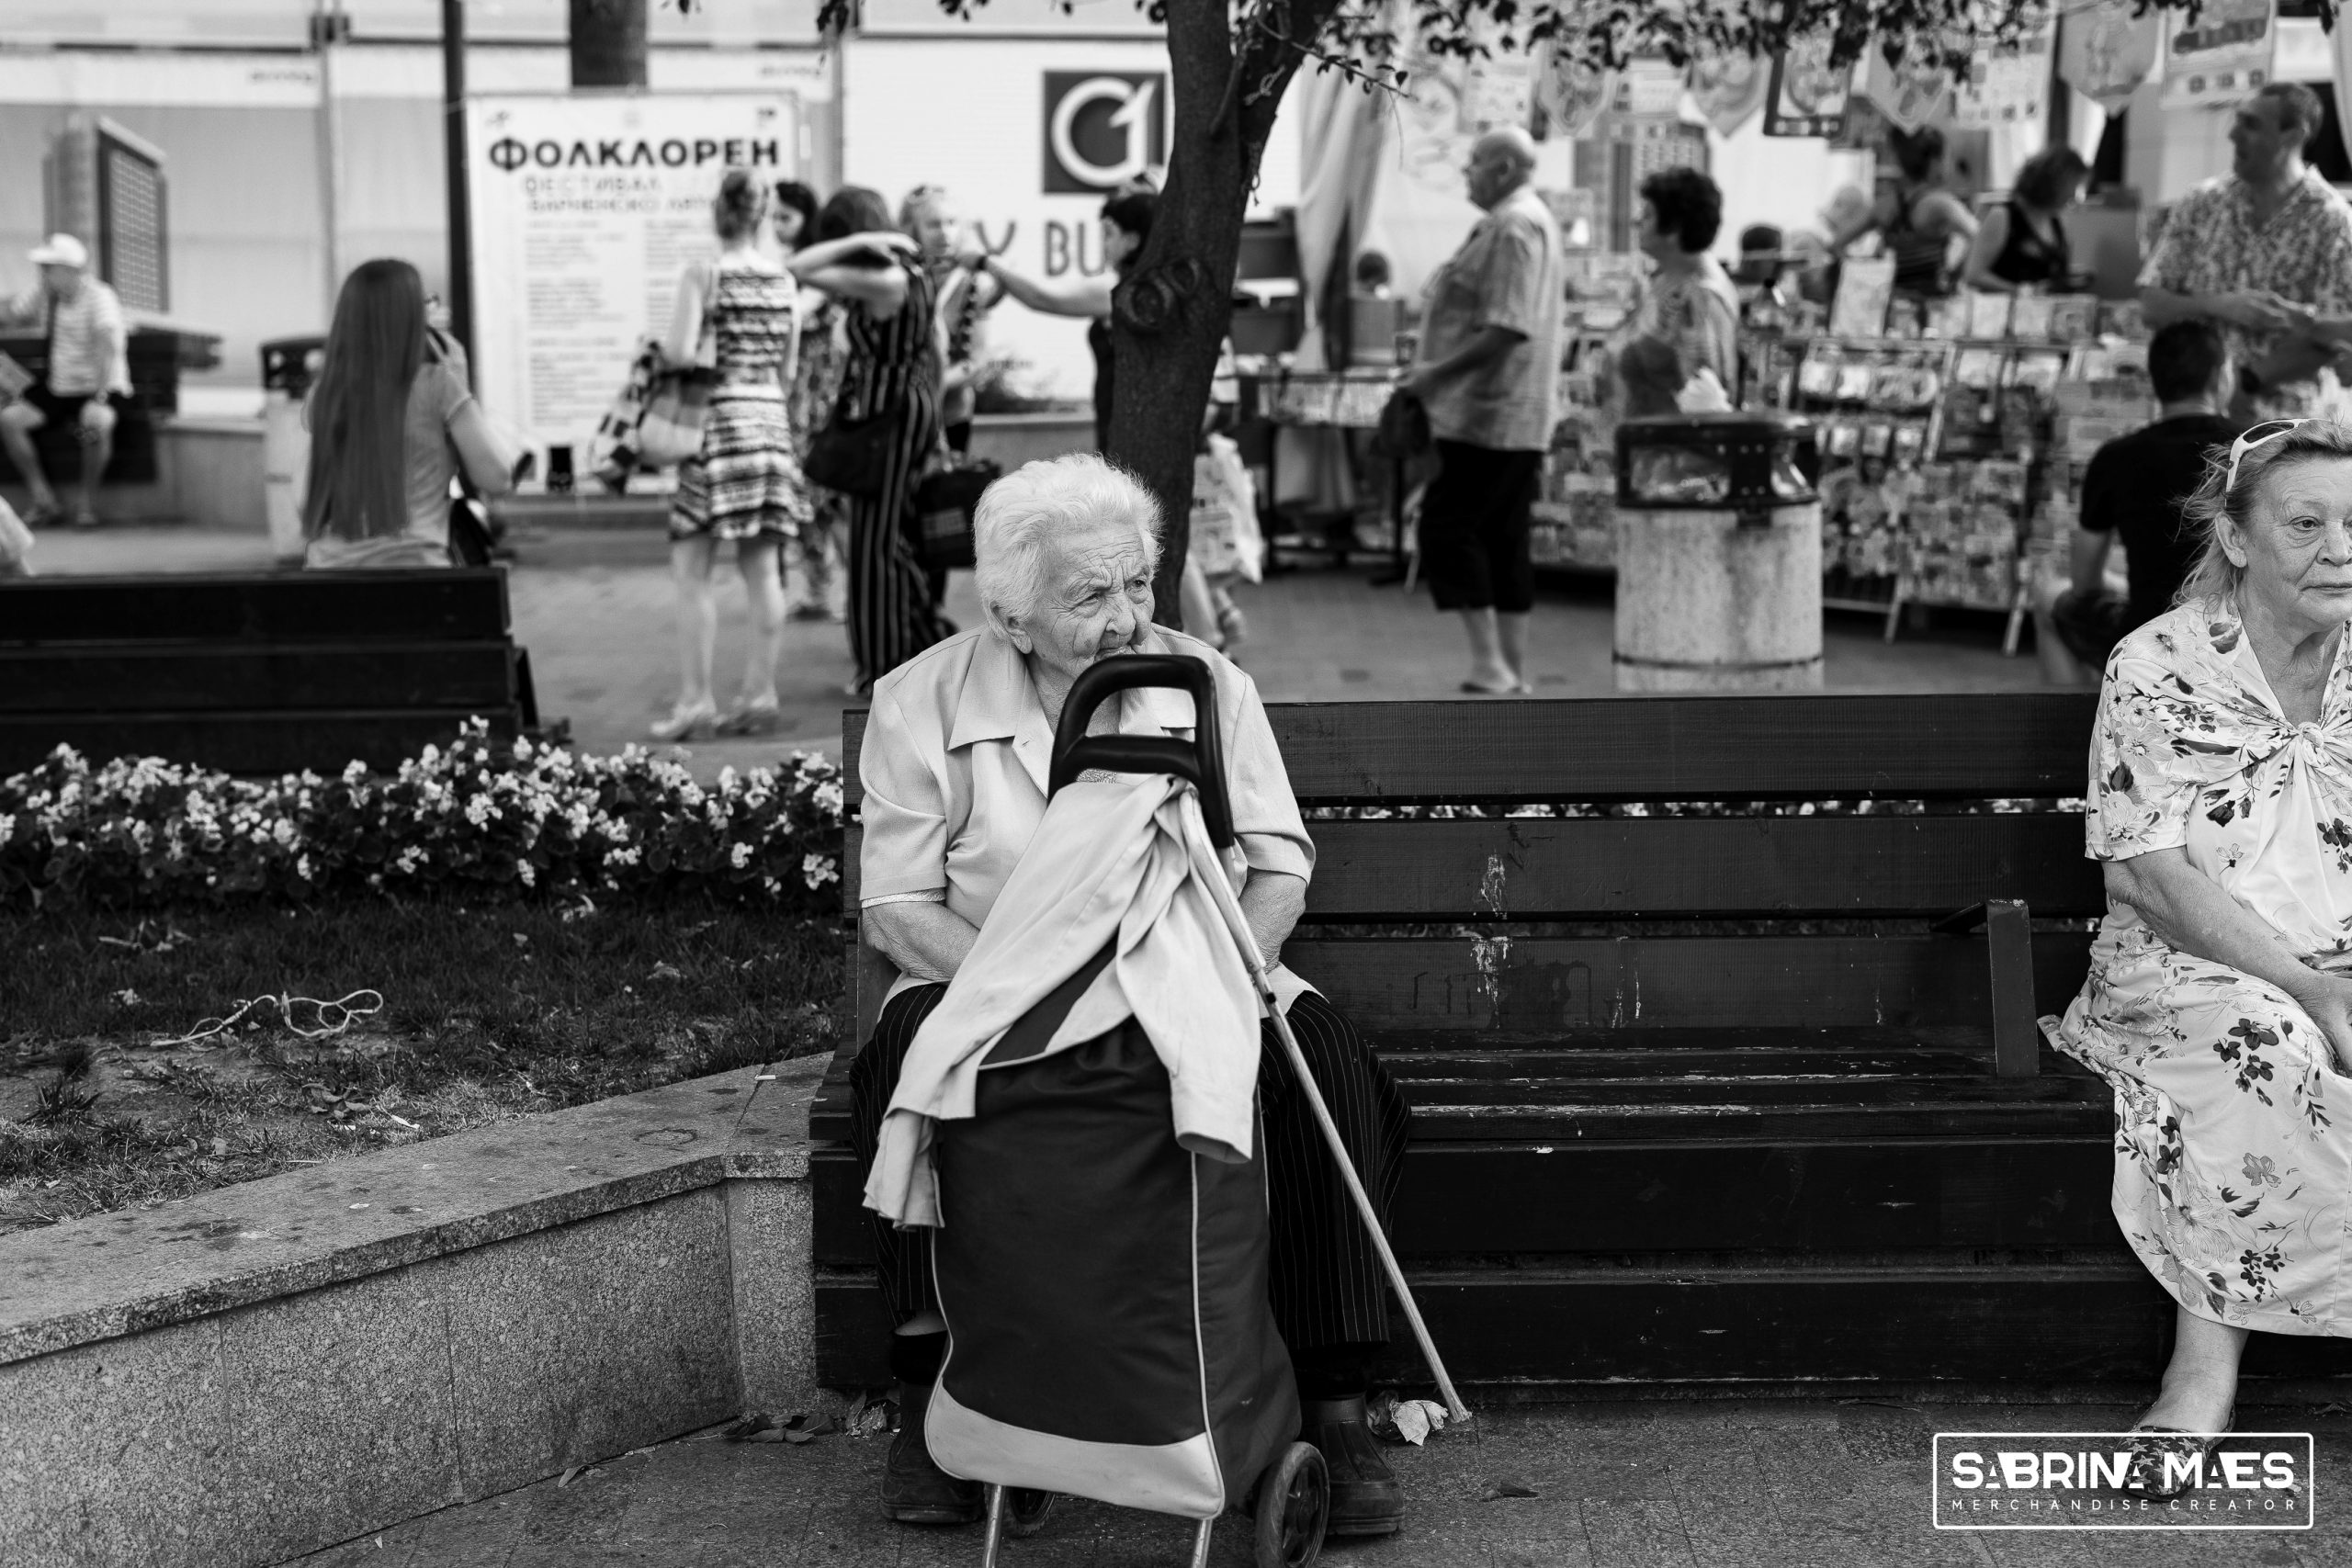 @Sabrina Maes, Post Pandemic Street Photography